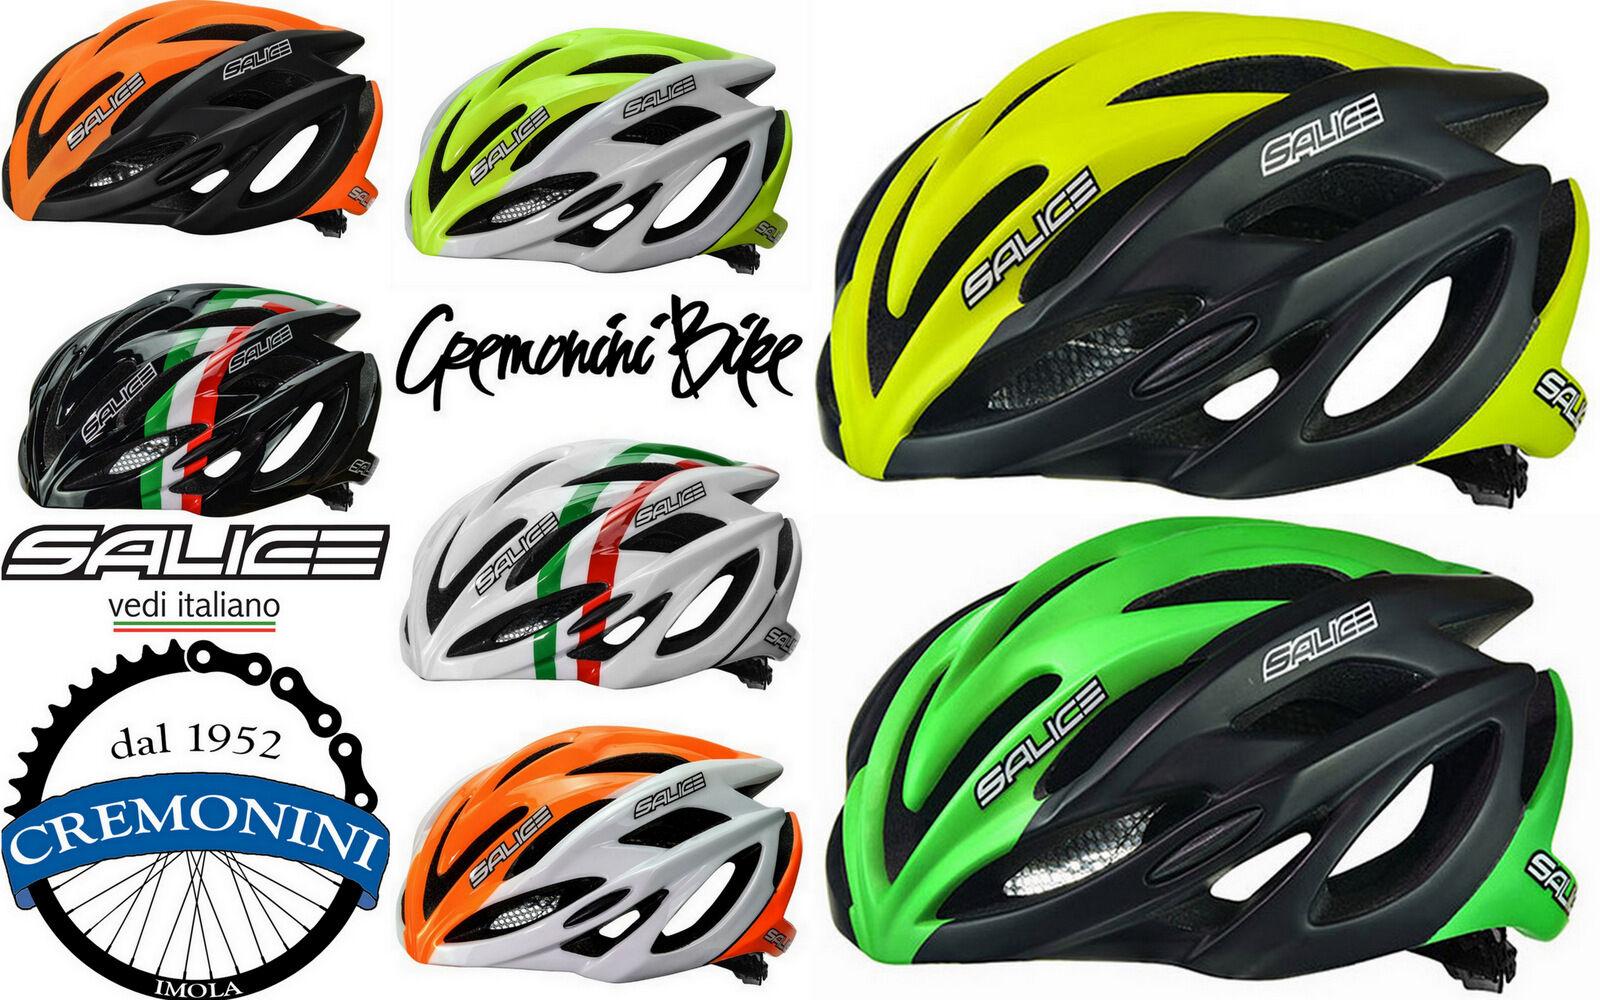 SALICE casco bici corsa mtb ciclismo bike helmet triColor mountain GHIBLI italy